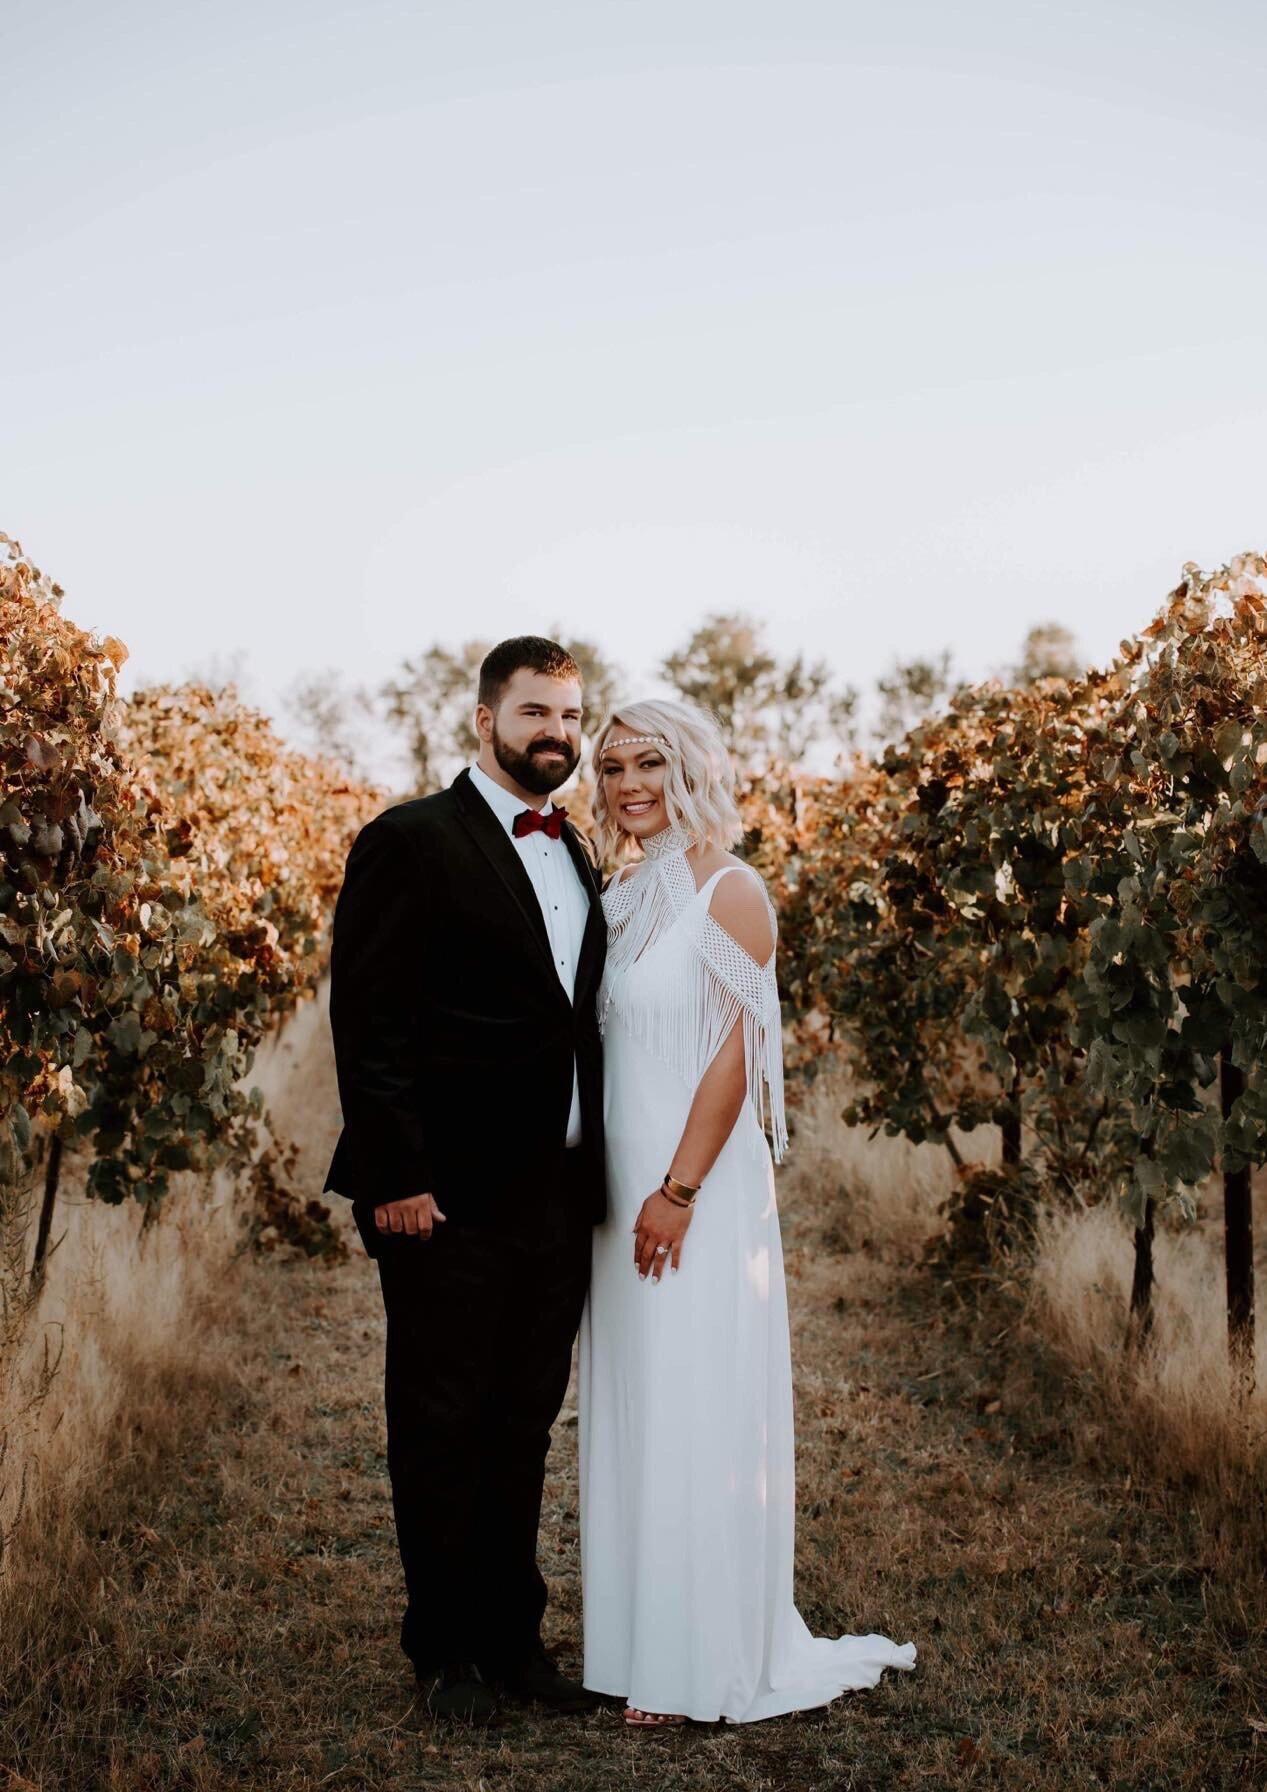 Wedding Dress Alterations in Wichita — VANYA DESIGNS